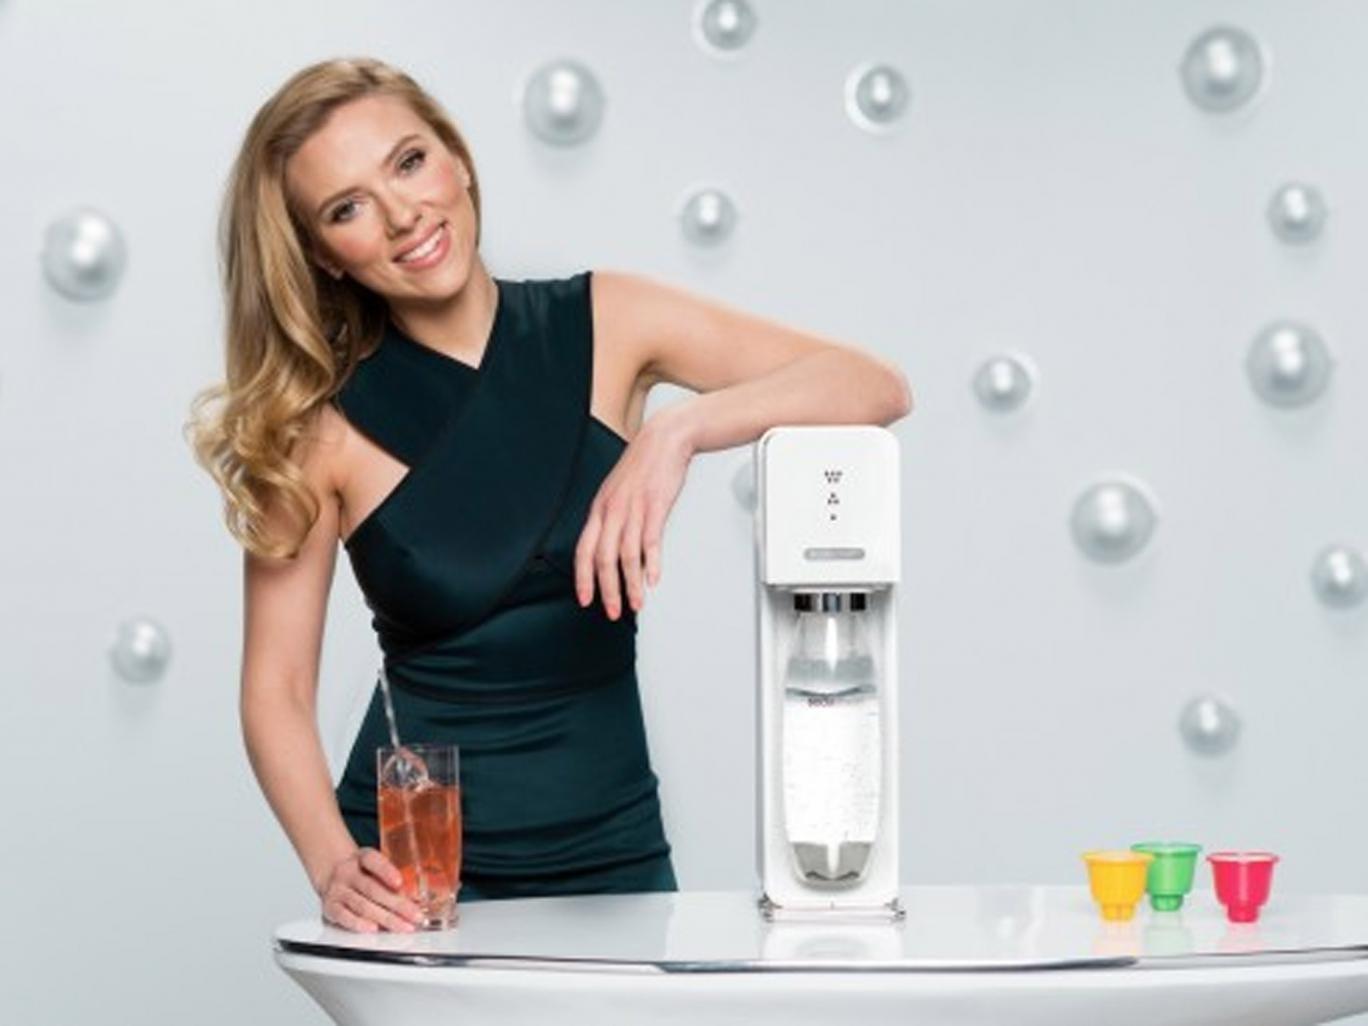 Scarlett Johansson appearing in the SodaStream commerical